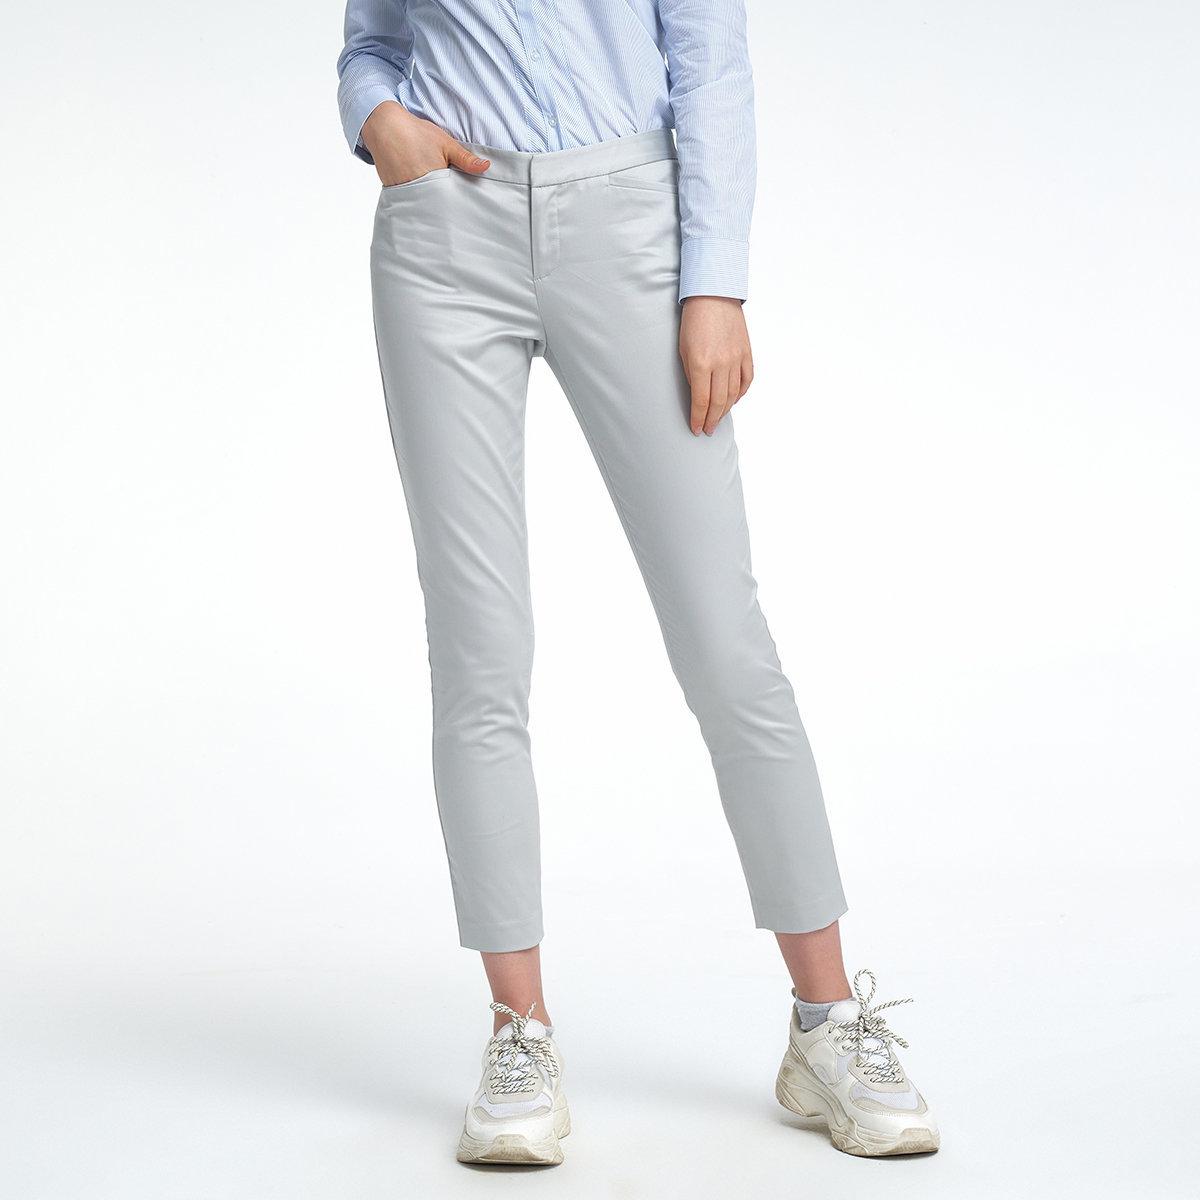 WOMEN'S PANTS(grey)